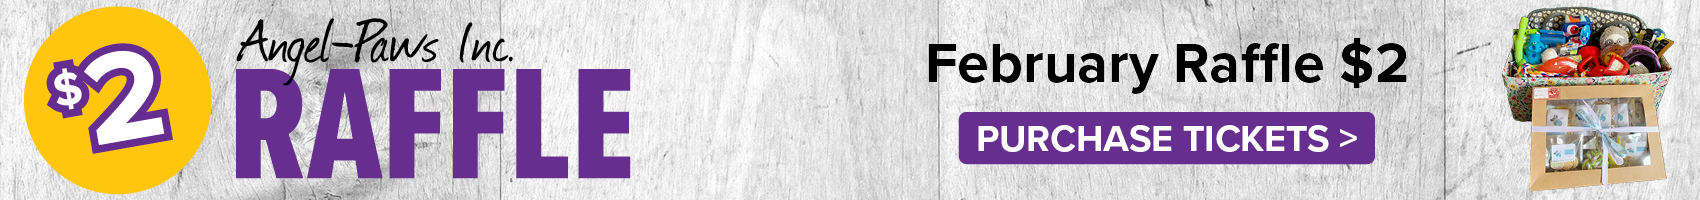 February Raffle Angel-Paws Inc